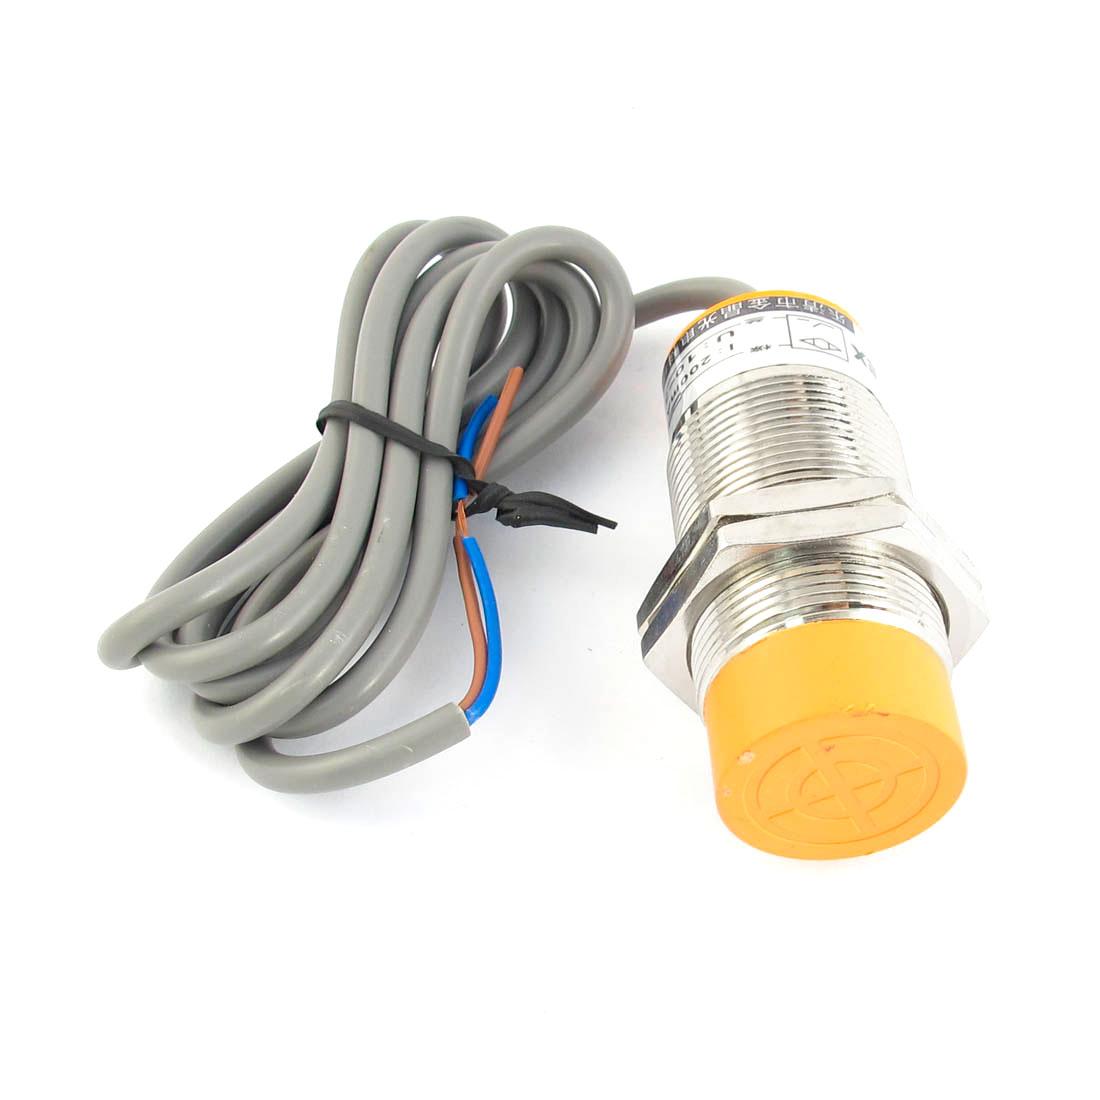 NO 15mm Detection Distance Inductive Sensor Proximity Switch LJ30A3-15-Z/EX